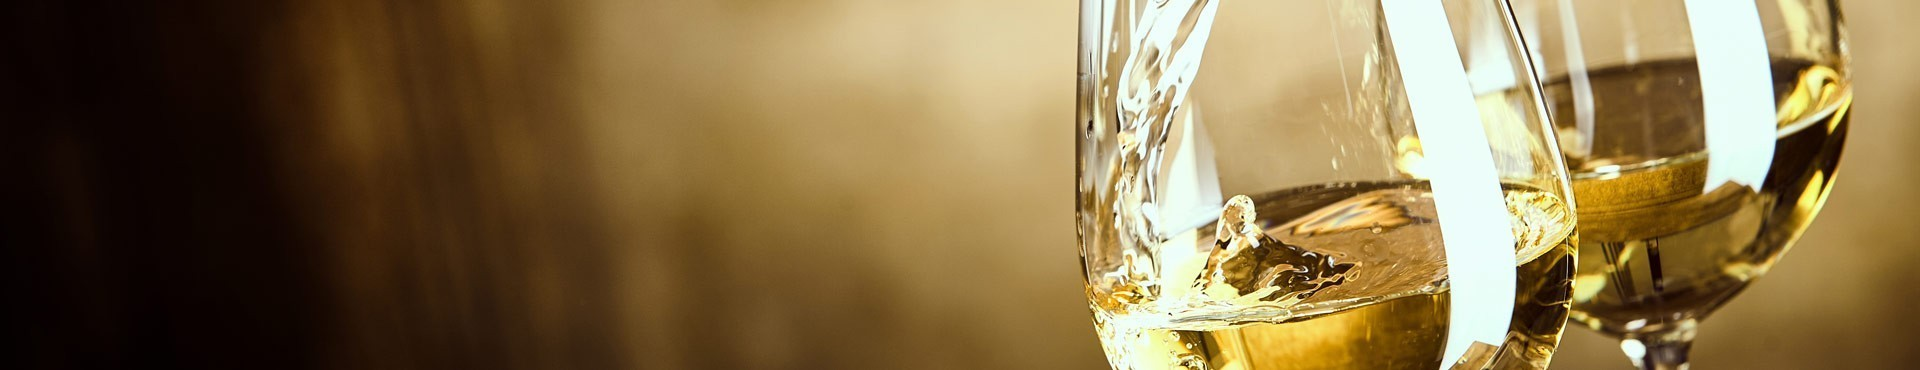 Nos vins blancs du Languedoc - OnWine